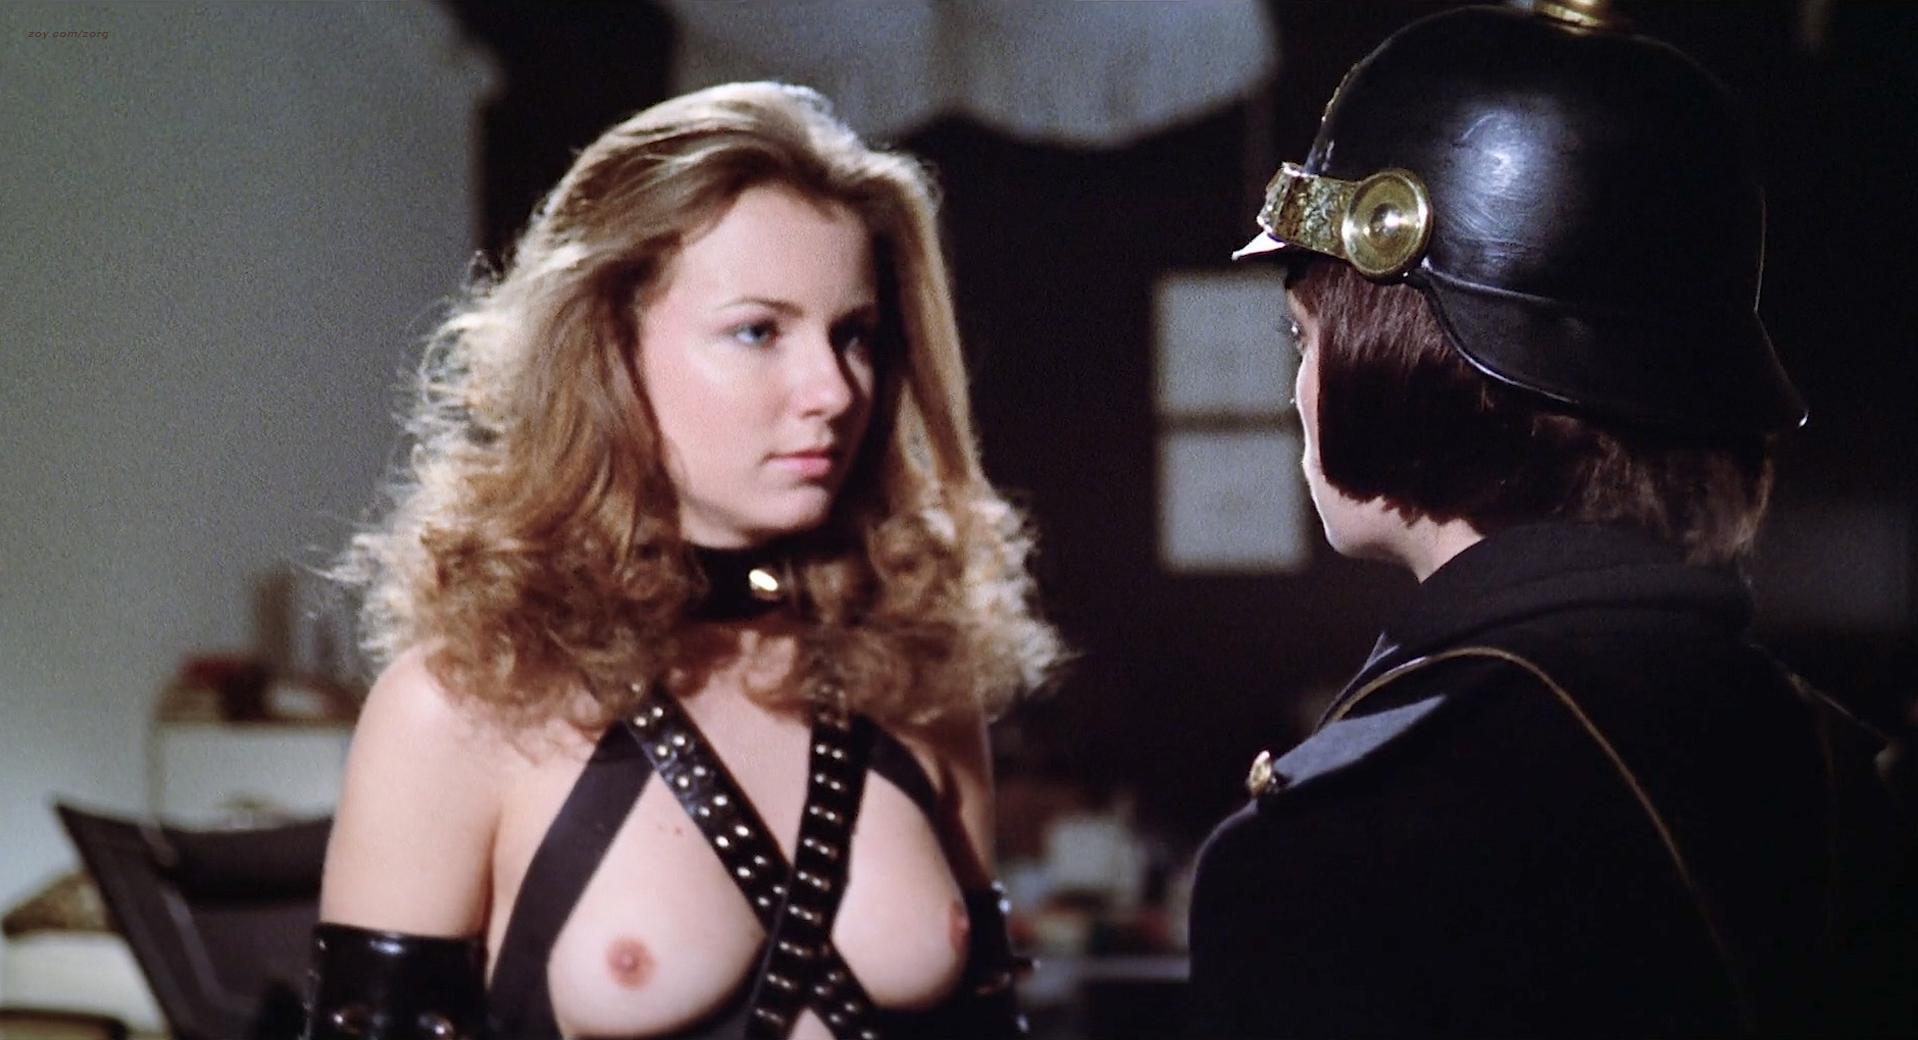 Isabelle De Funes nude, Ely Galleani nude, Carroll Baker nude, Angela Covello nude - Baba Yaga (1973)